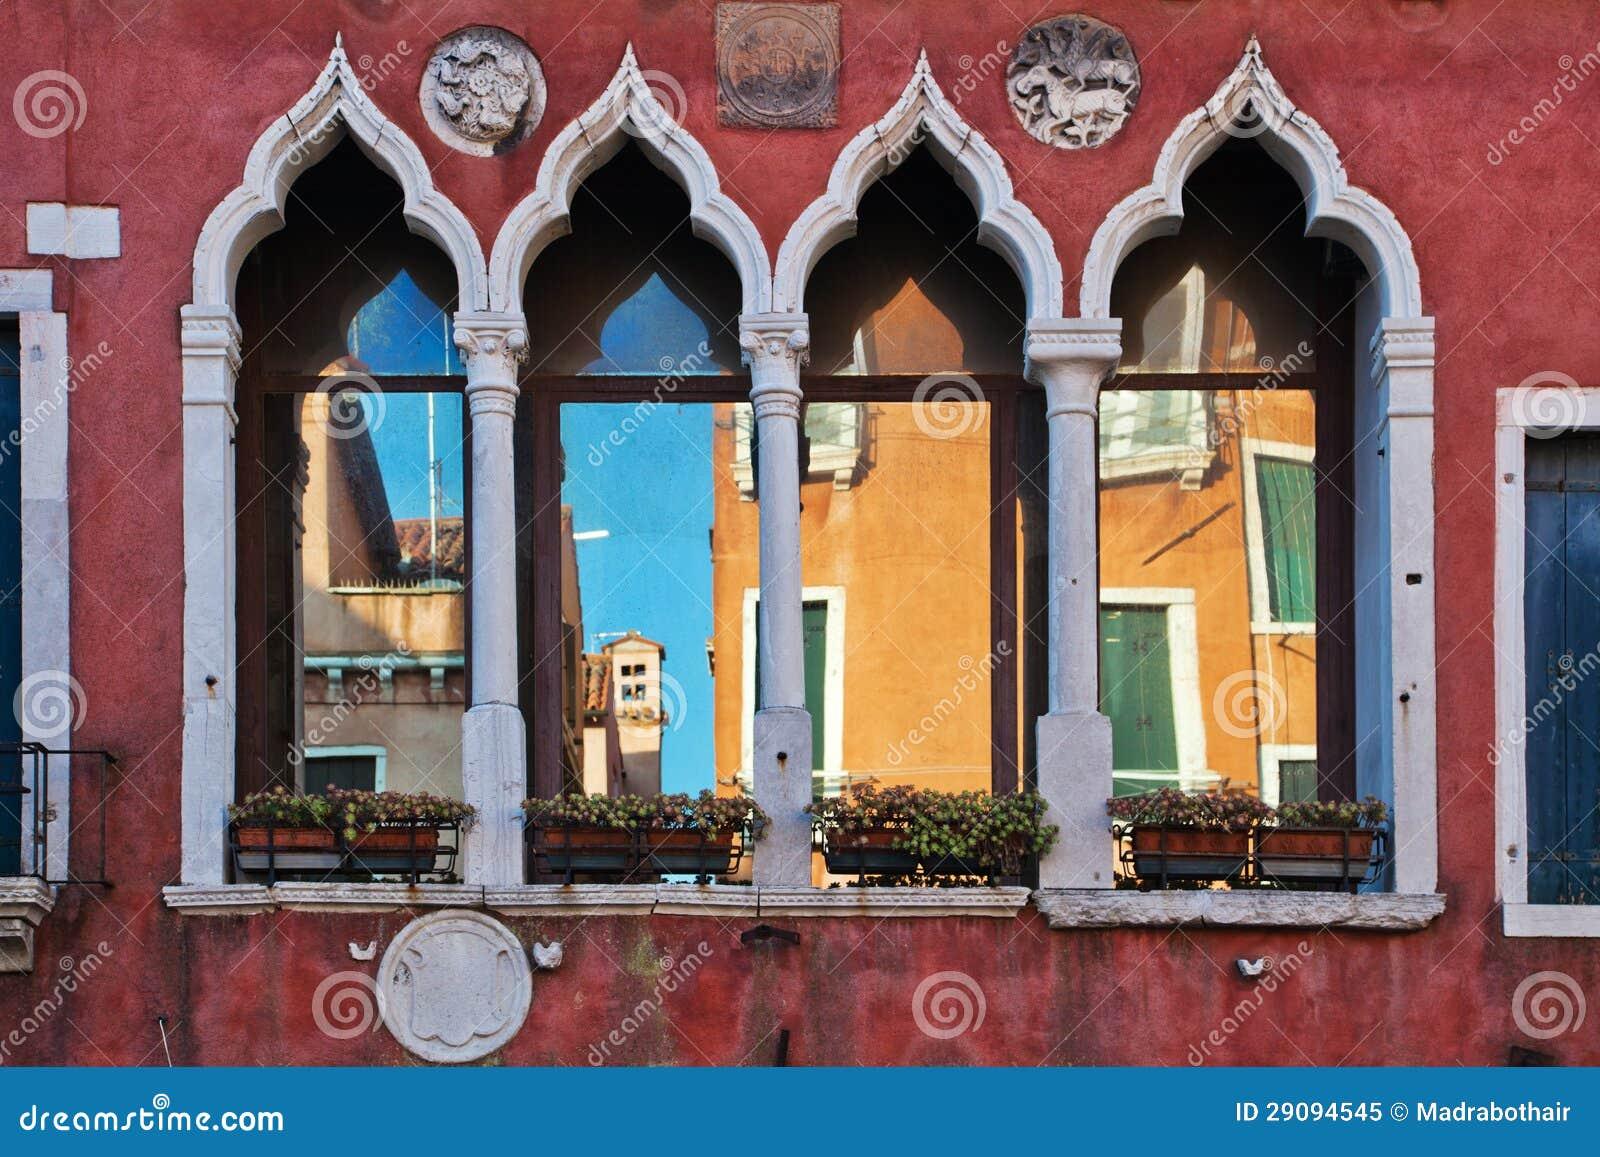 Finestre veneziane caratteristiche fotografia stock libera da diritti immagine 29094545 - Veneziane per finestre ...